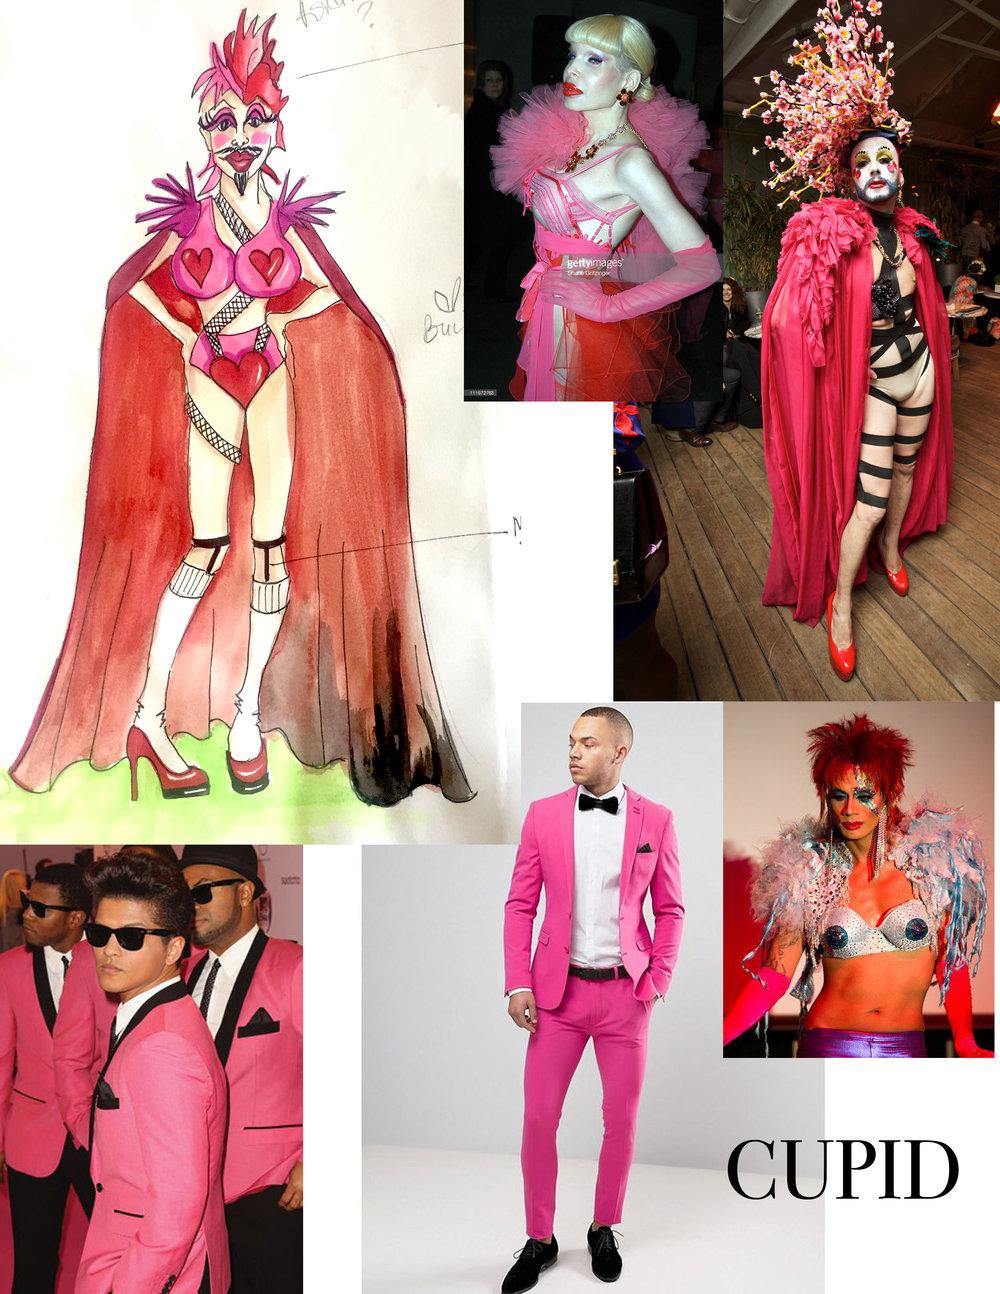 cupid collage.jpg